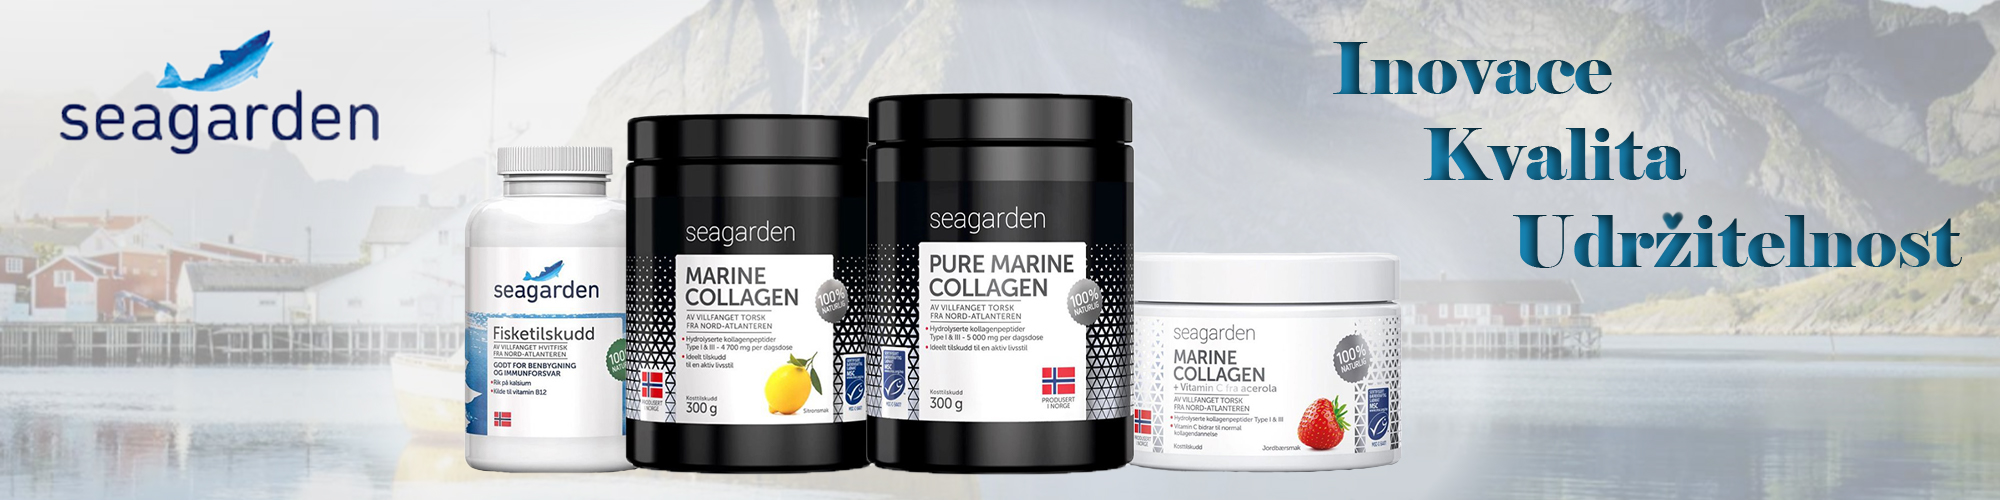 Seagarden - Severoatlantická kvalita